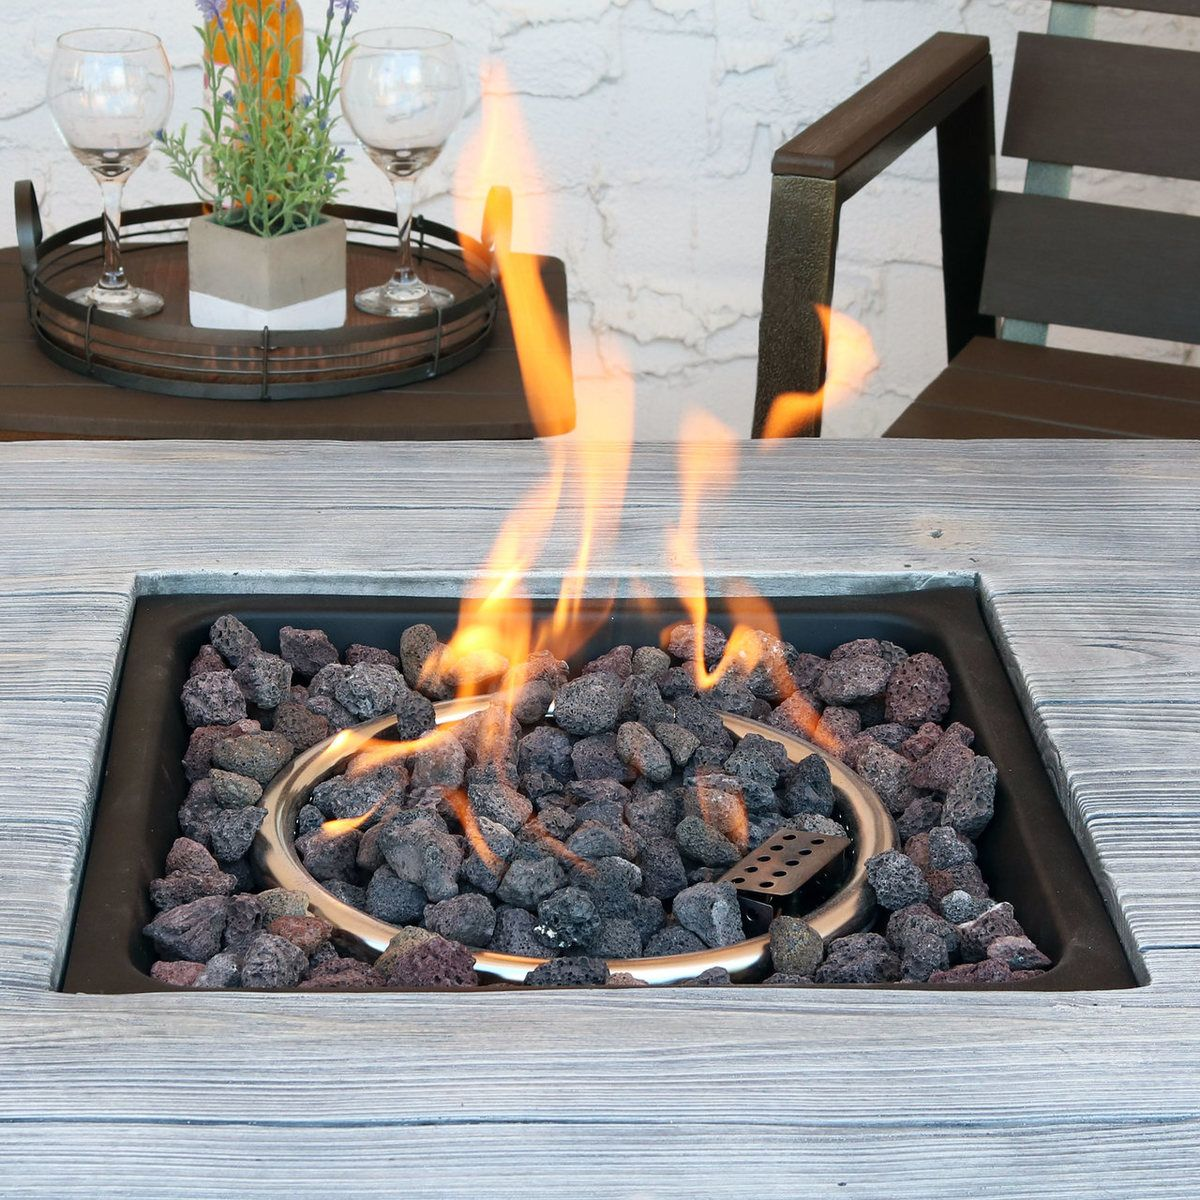 Sunnydaze Outdoor 30 Inch Square Propane Gas Fire Pit